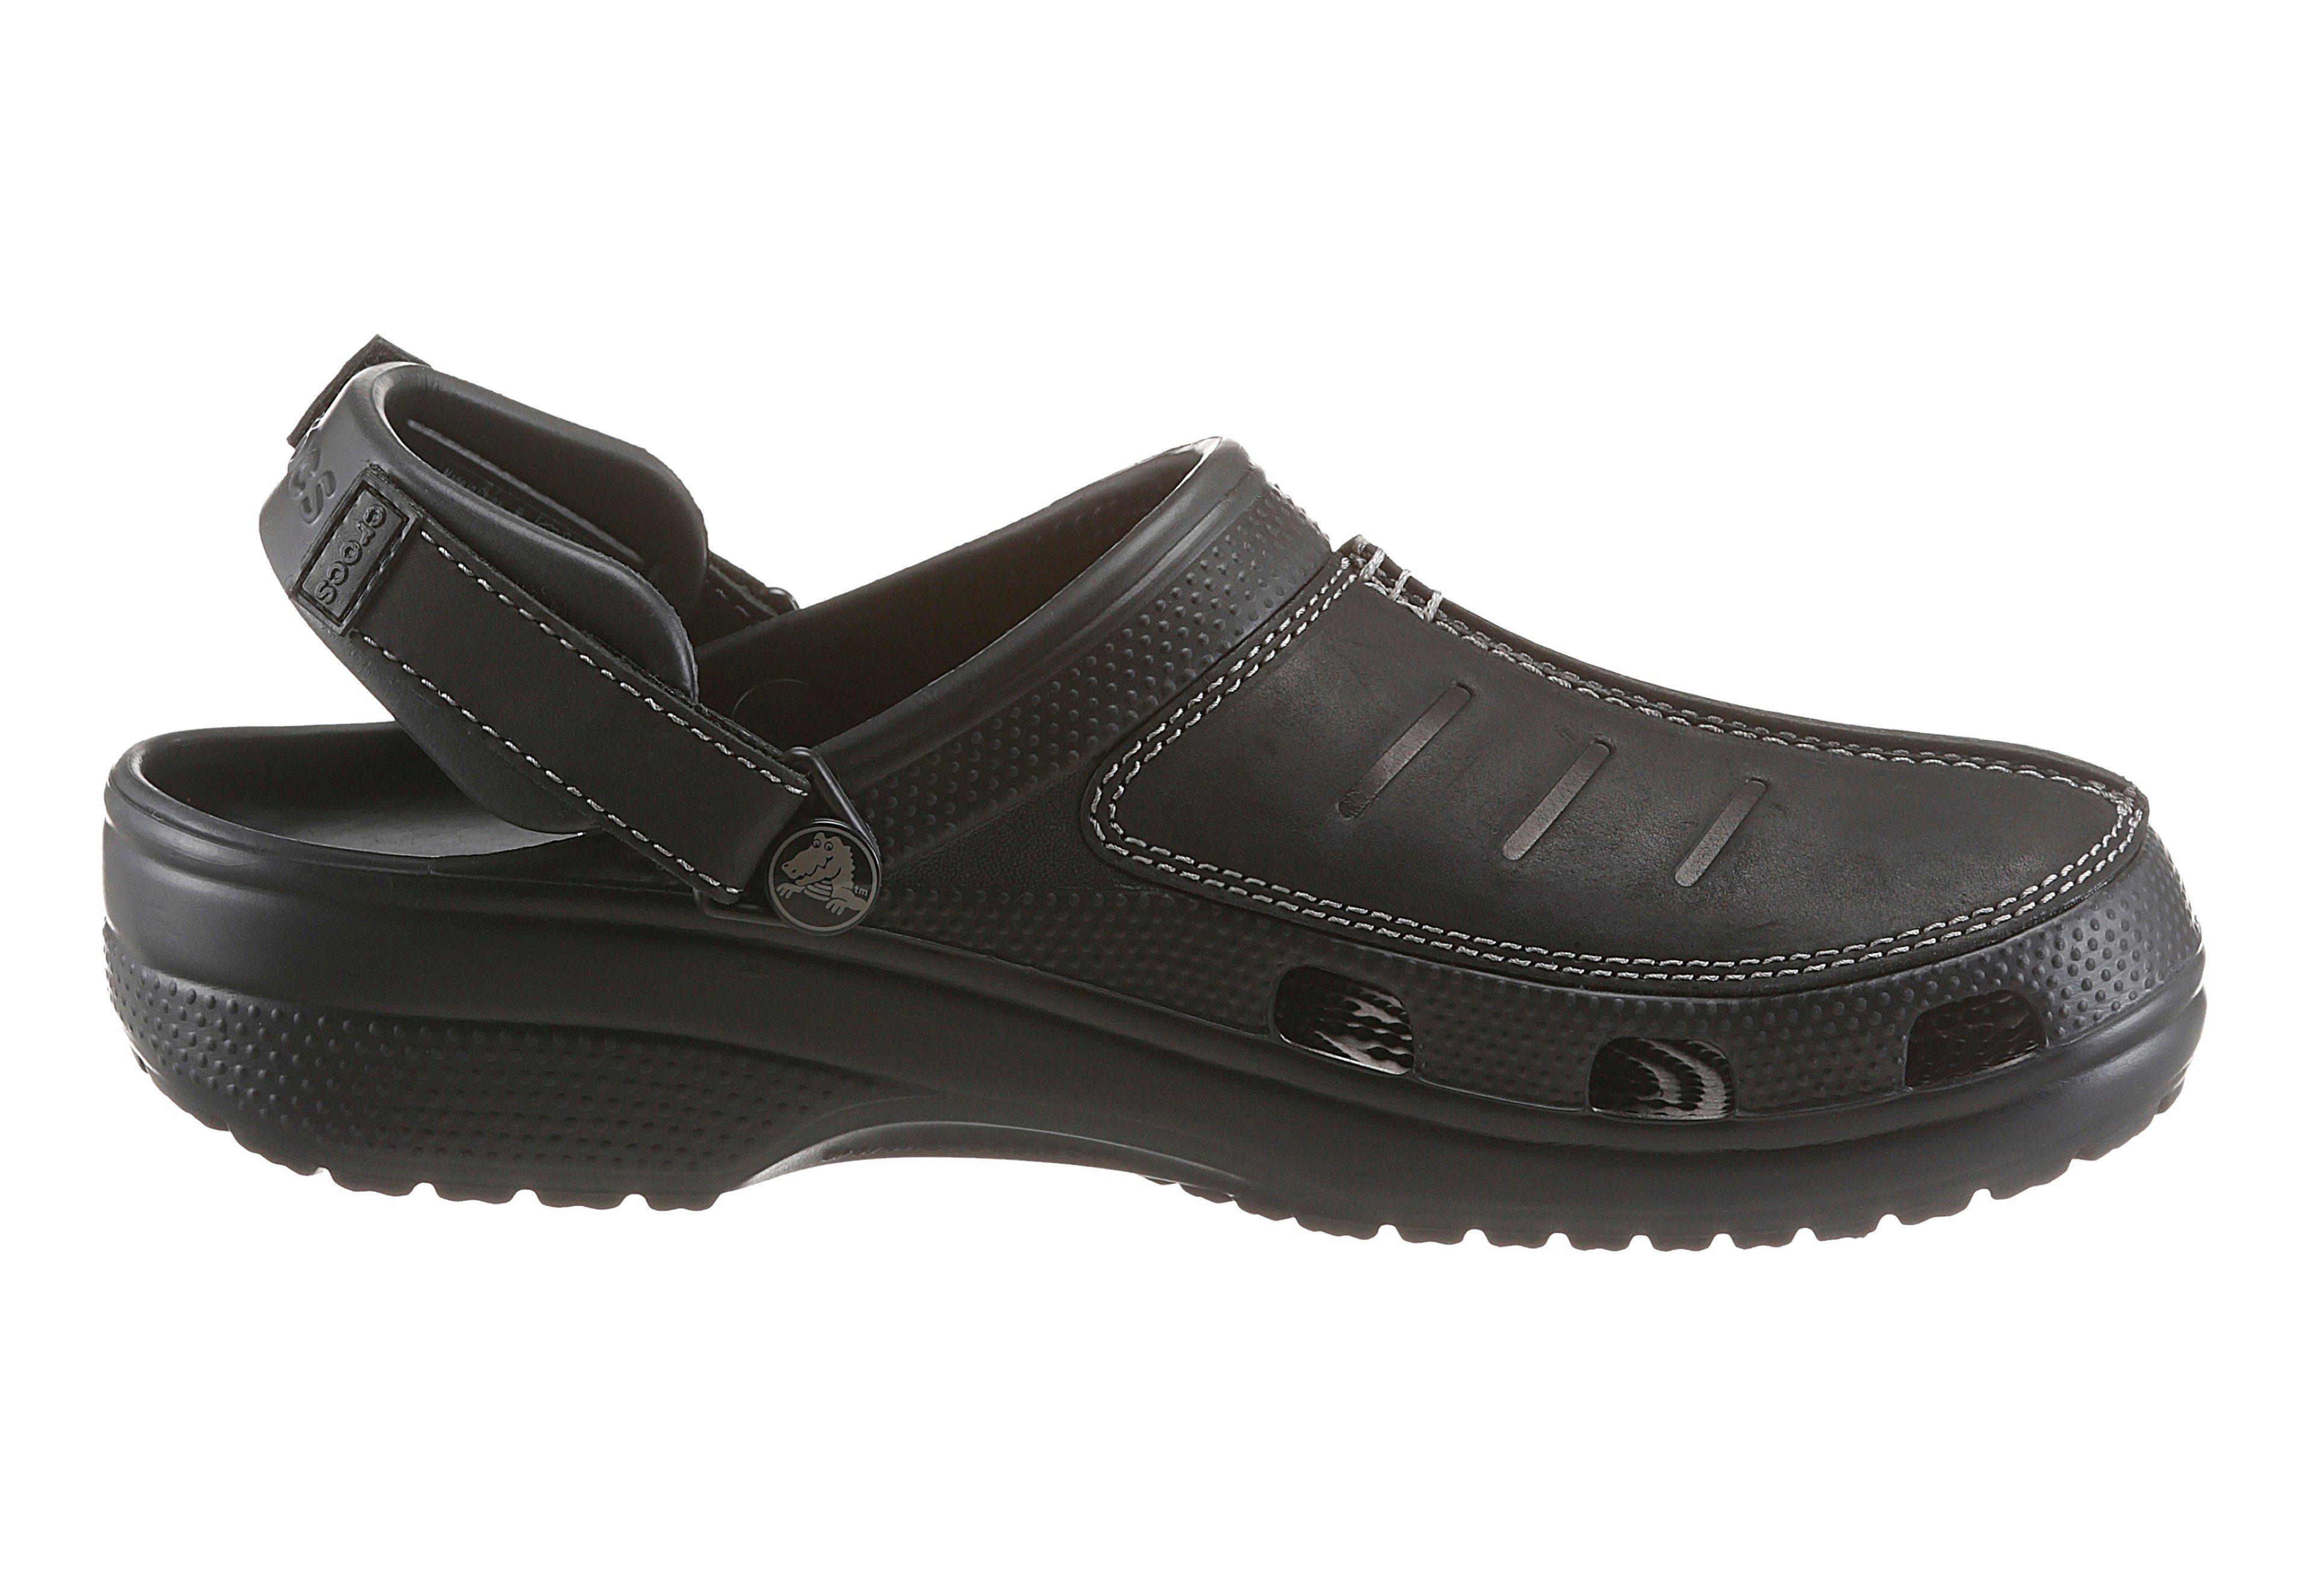 Crocs Yukon Mesa Clog Clog online kaufen  schwarz